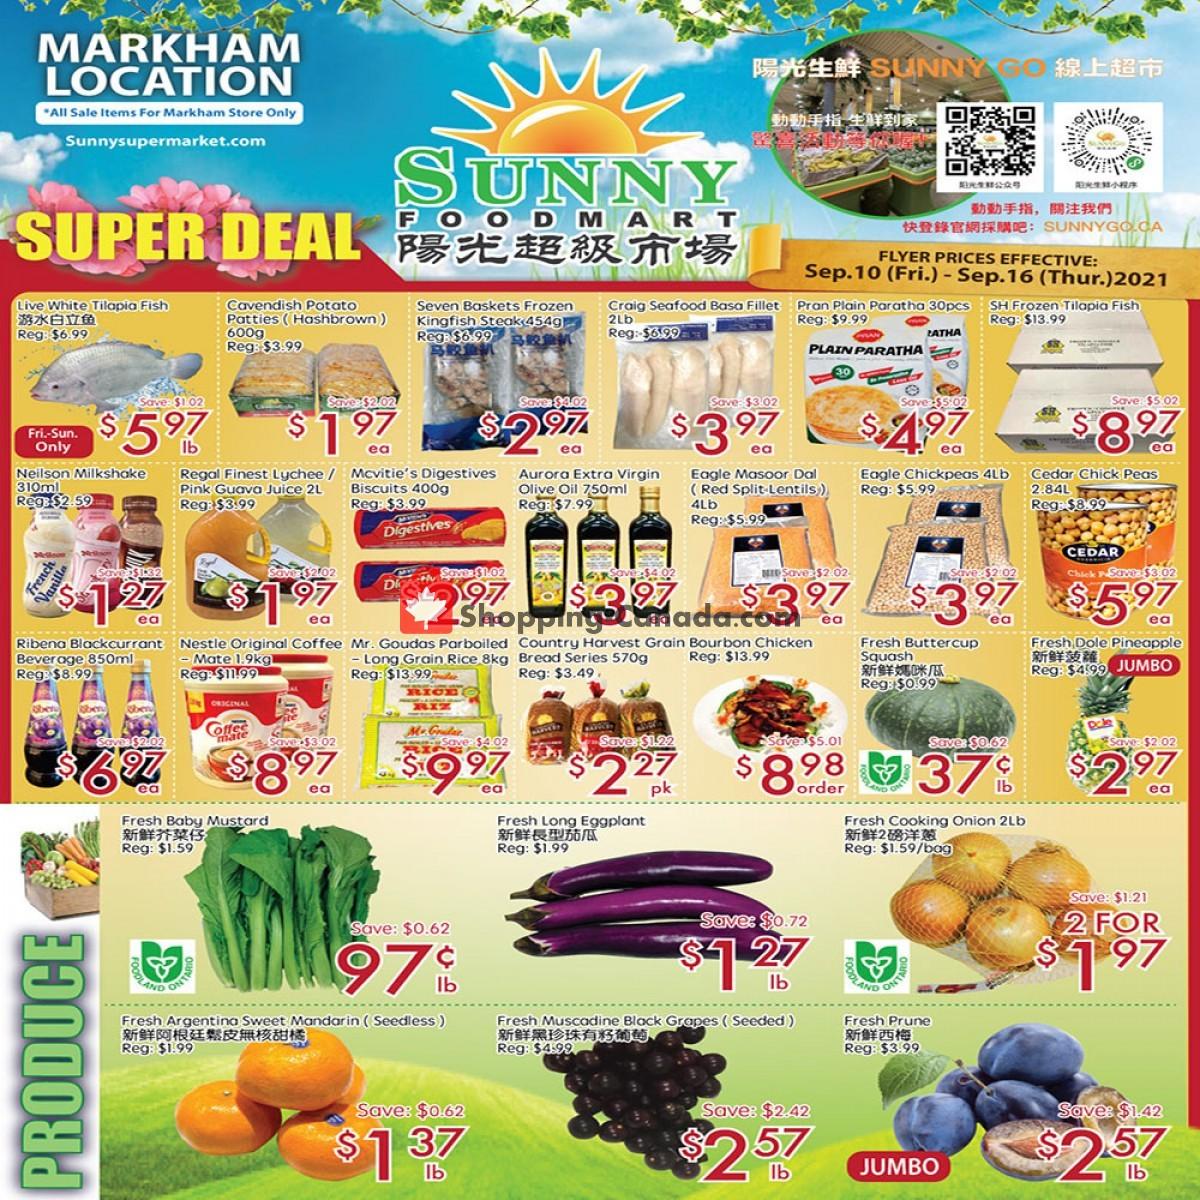 Flyer Sunny Foodmart Canada - from Friday September 10, 2021 to Thursday September 16, 2021